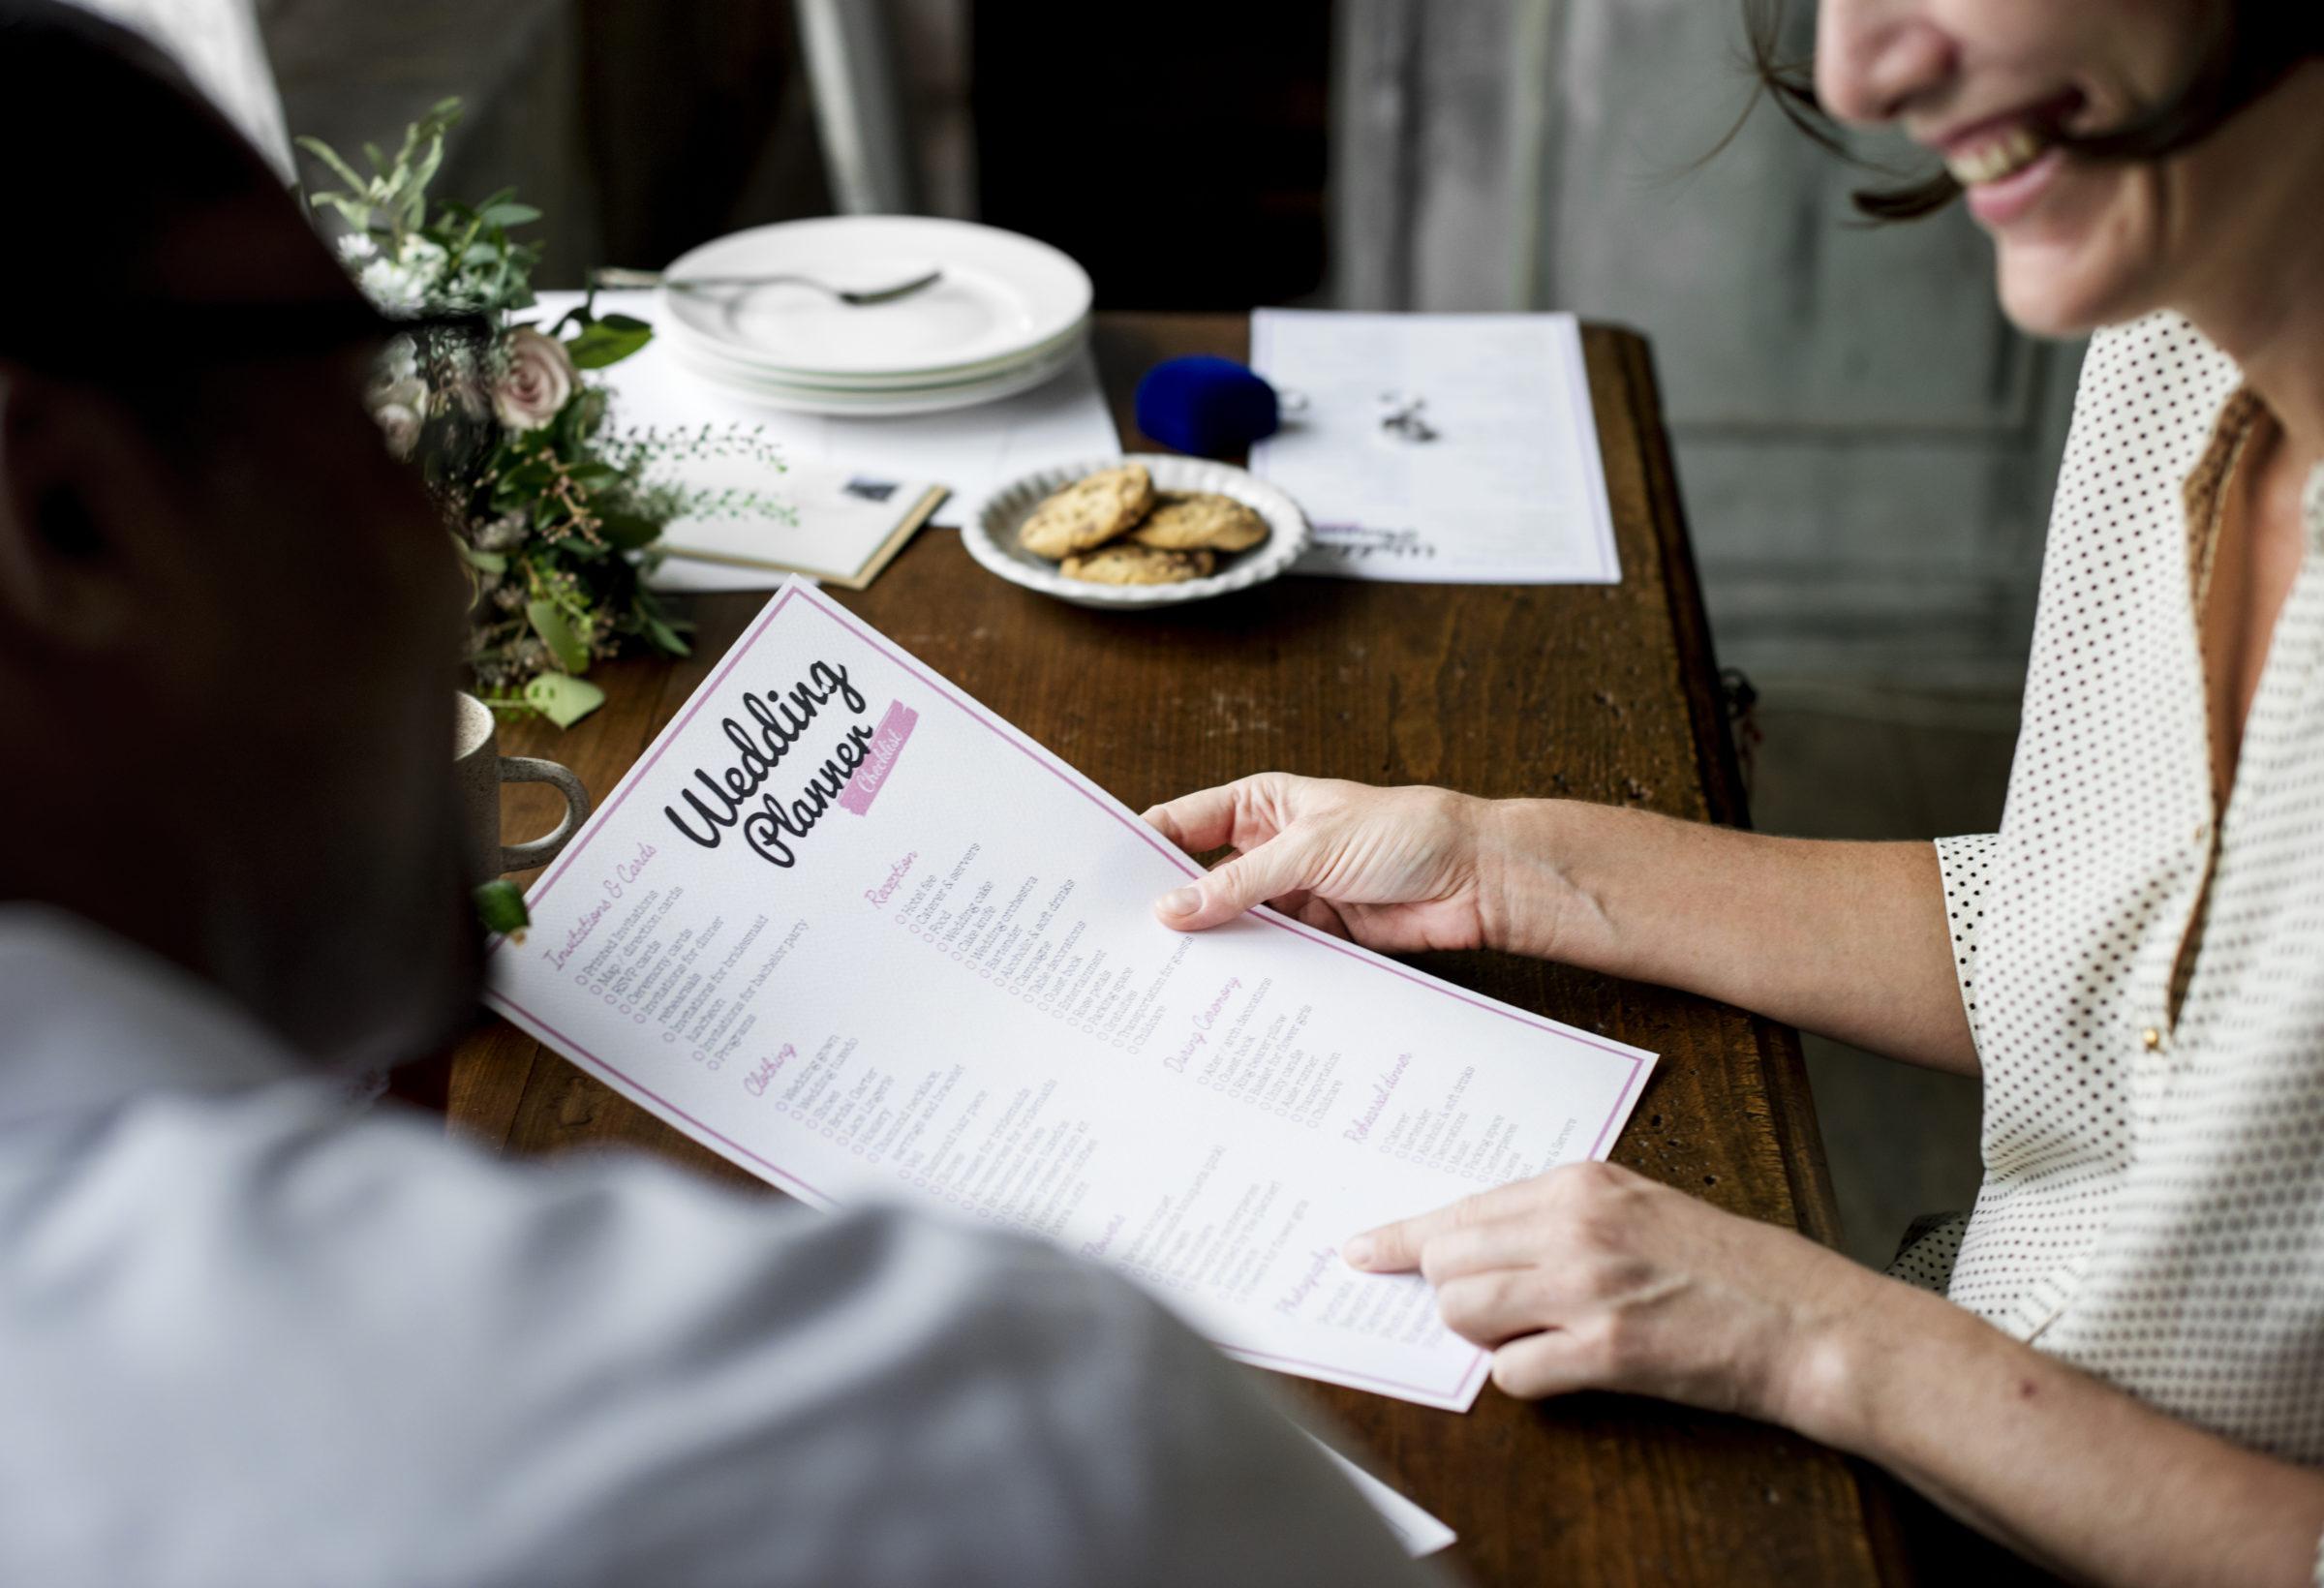 hands holding wedding planner checklist informatio PSGQEUR